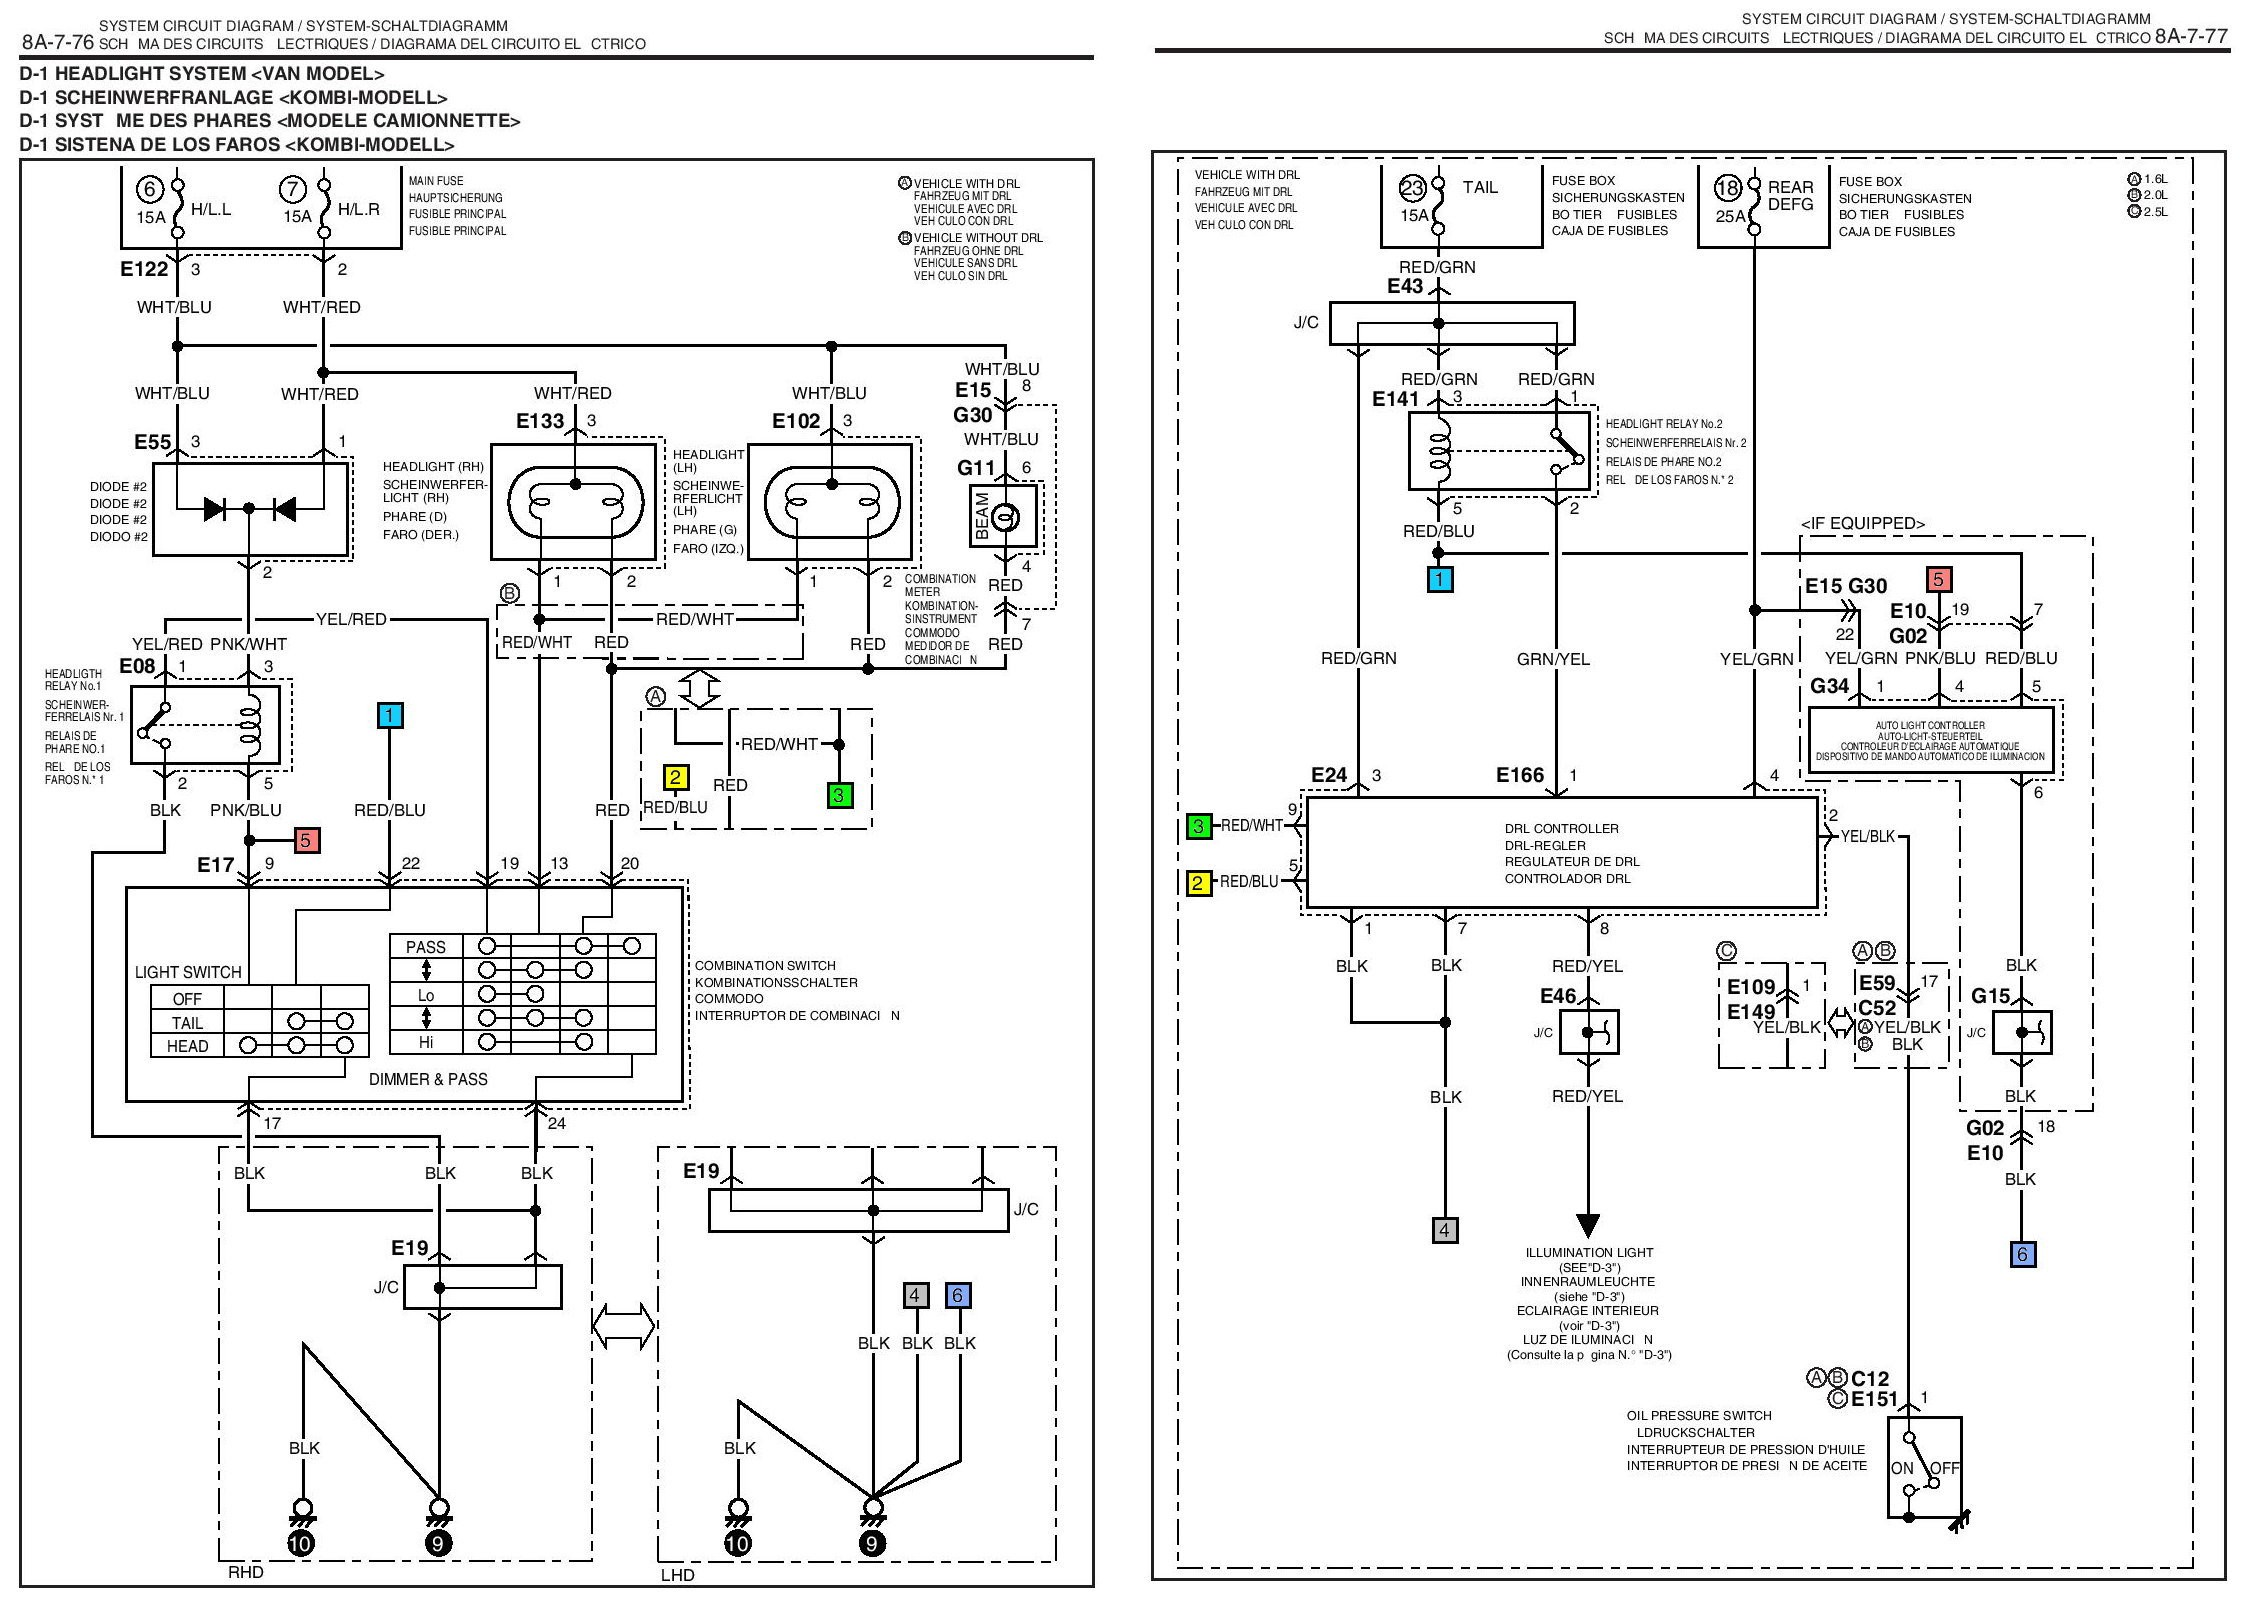 91 daihatsu rocky wiring diagram